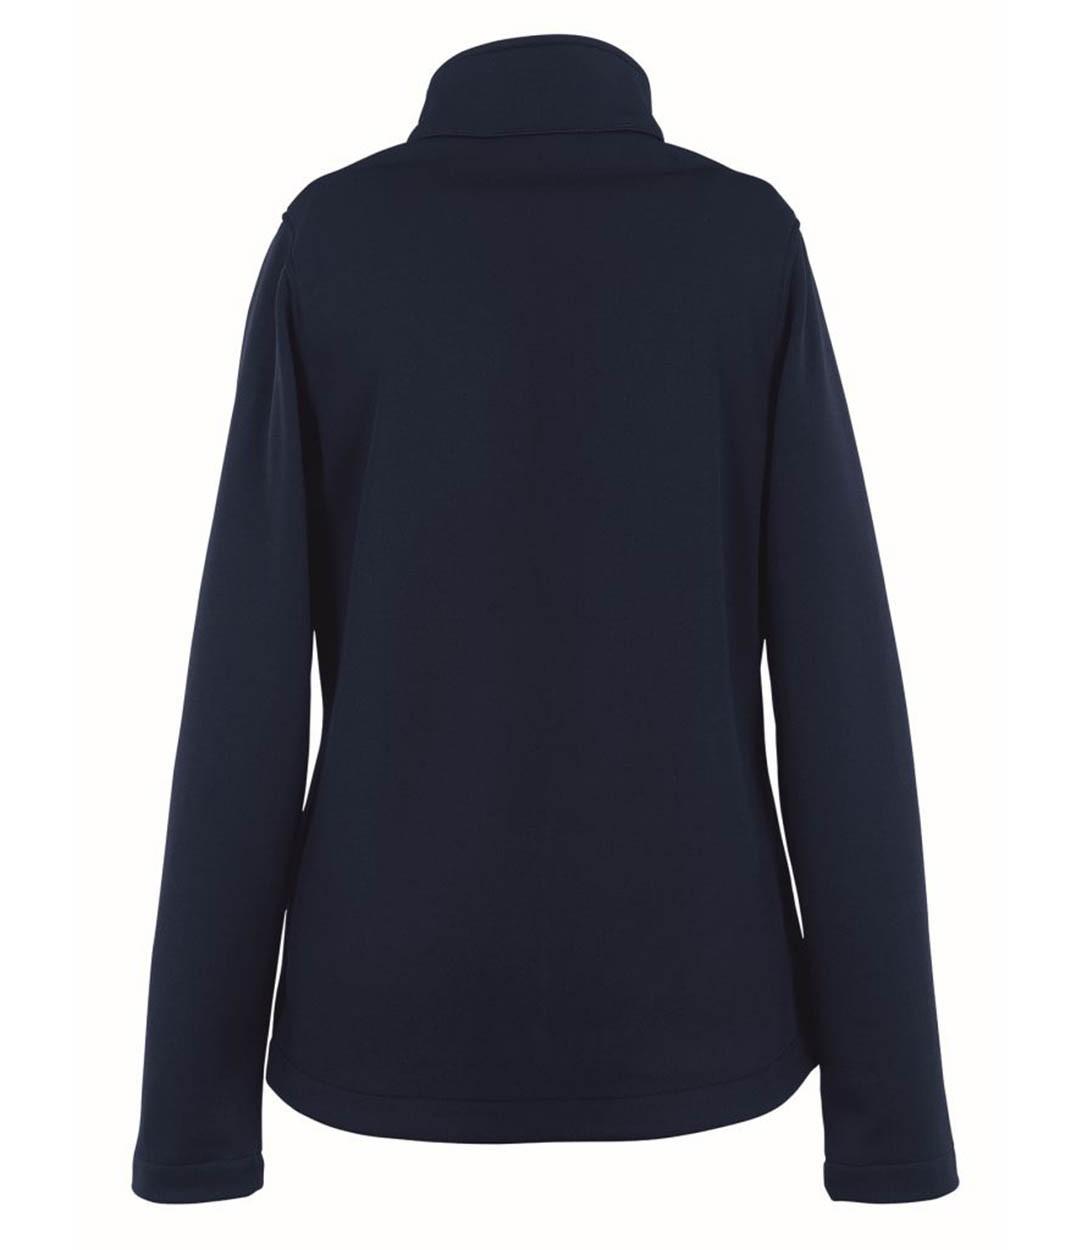 5d29b2d4 Russell 040F Ladies Smart Softshell Jacket - Softshell - Leisurewear - Best  Workwear